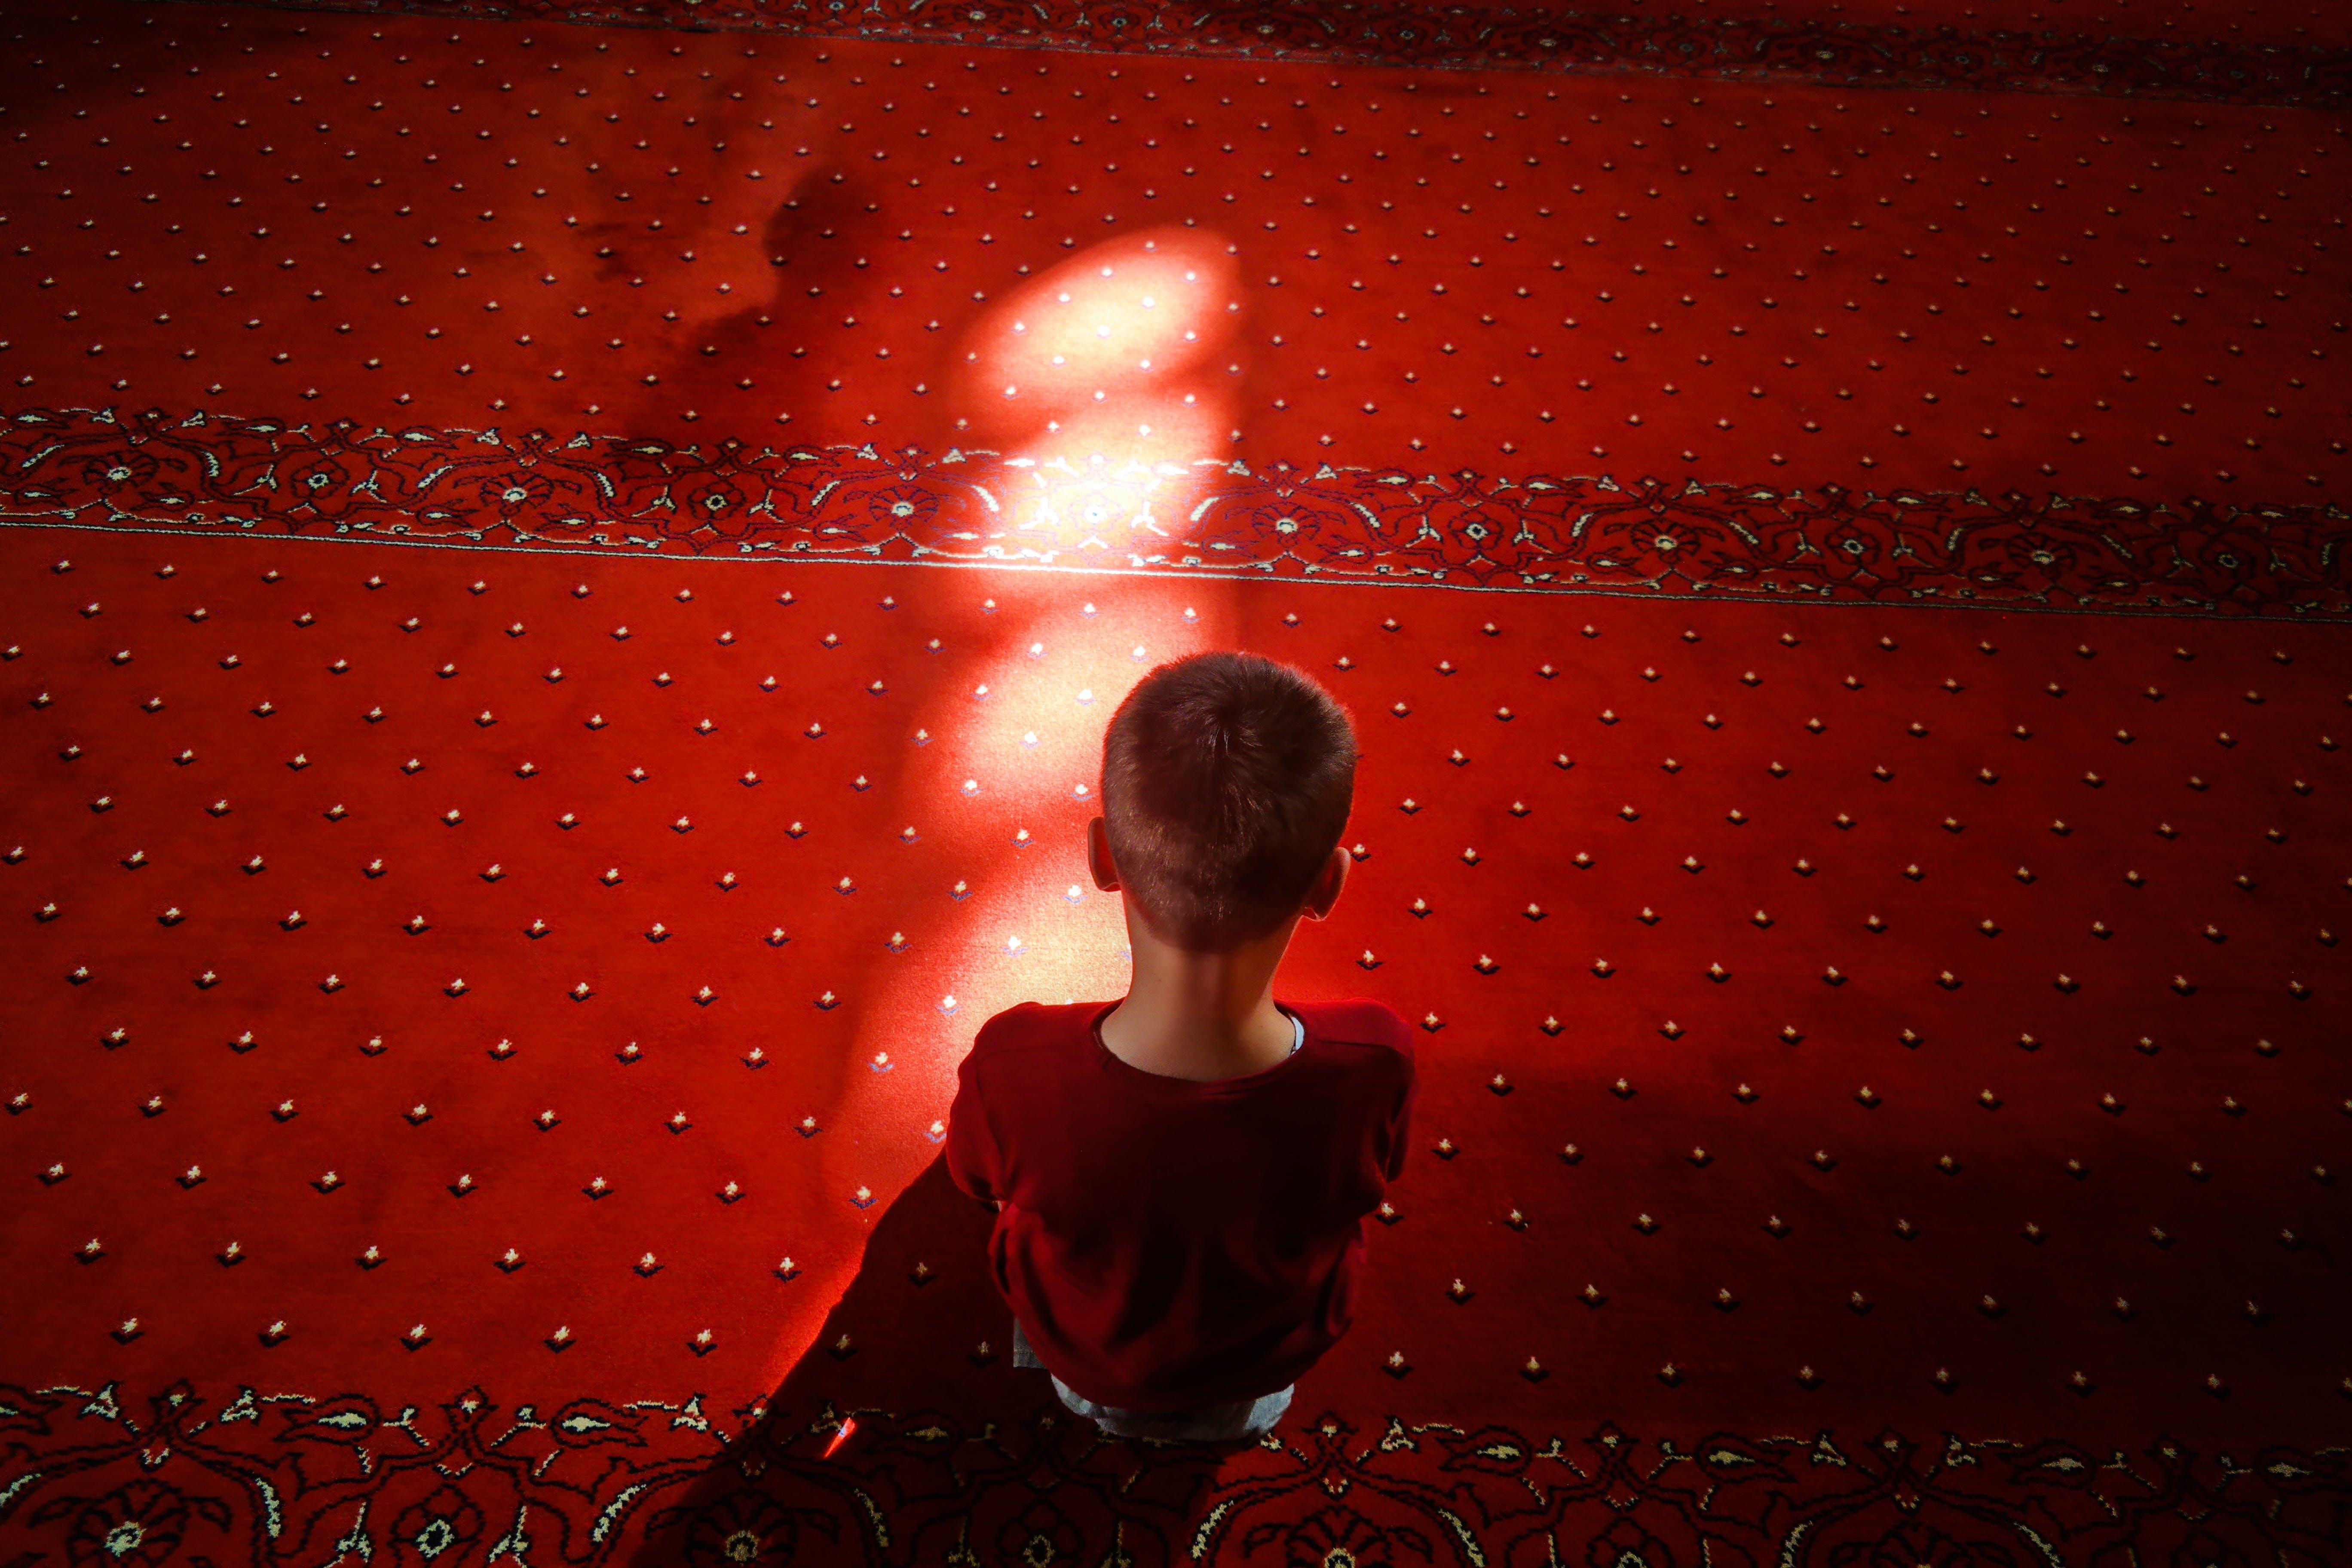 Child Sitting on Red Carpet